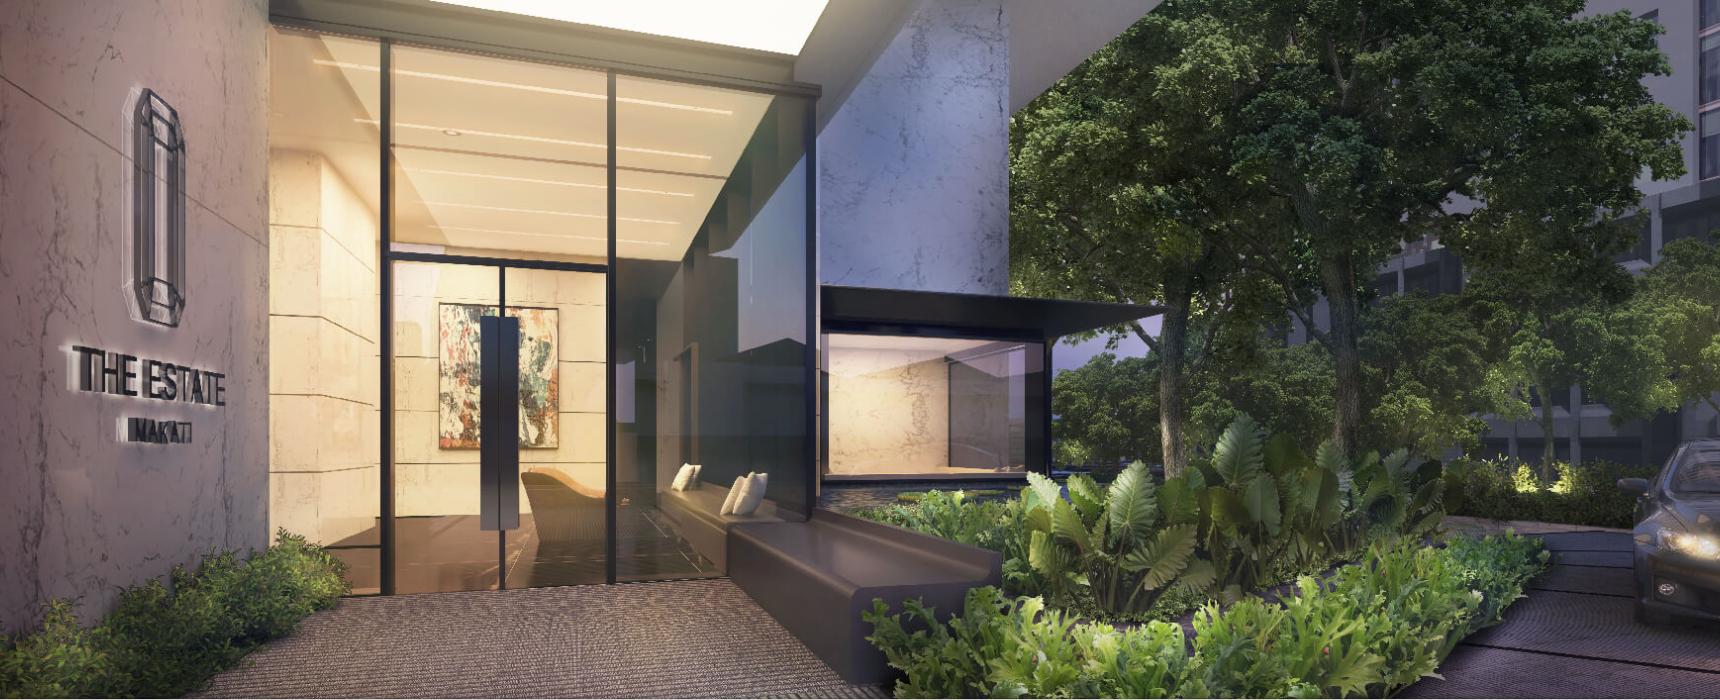 The estate Makati 2